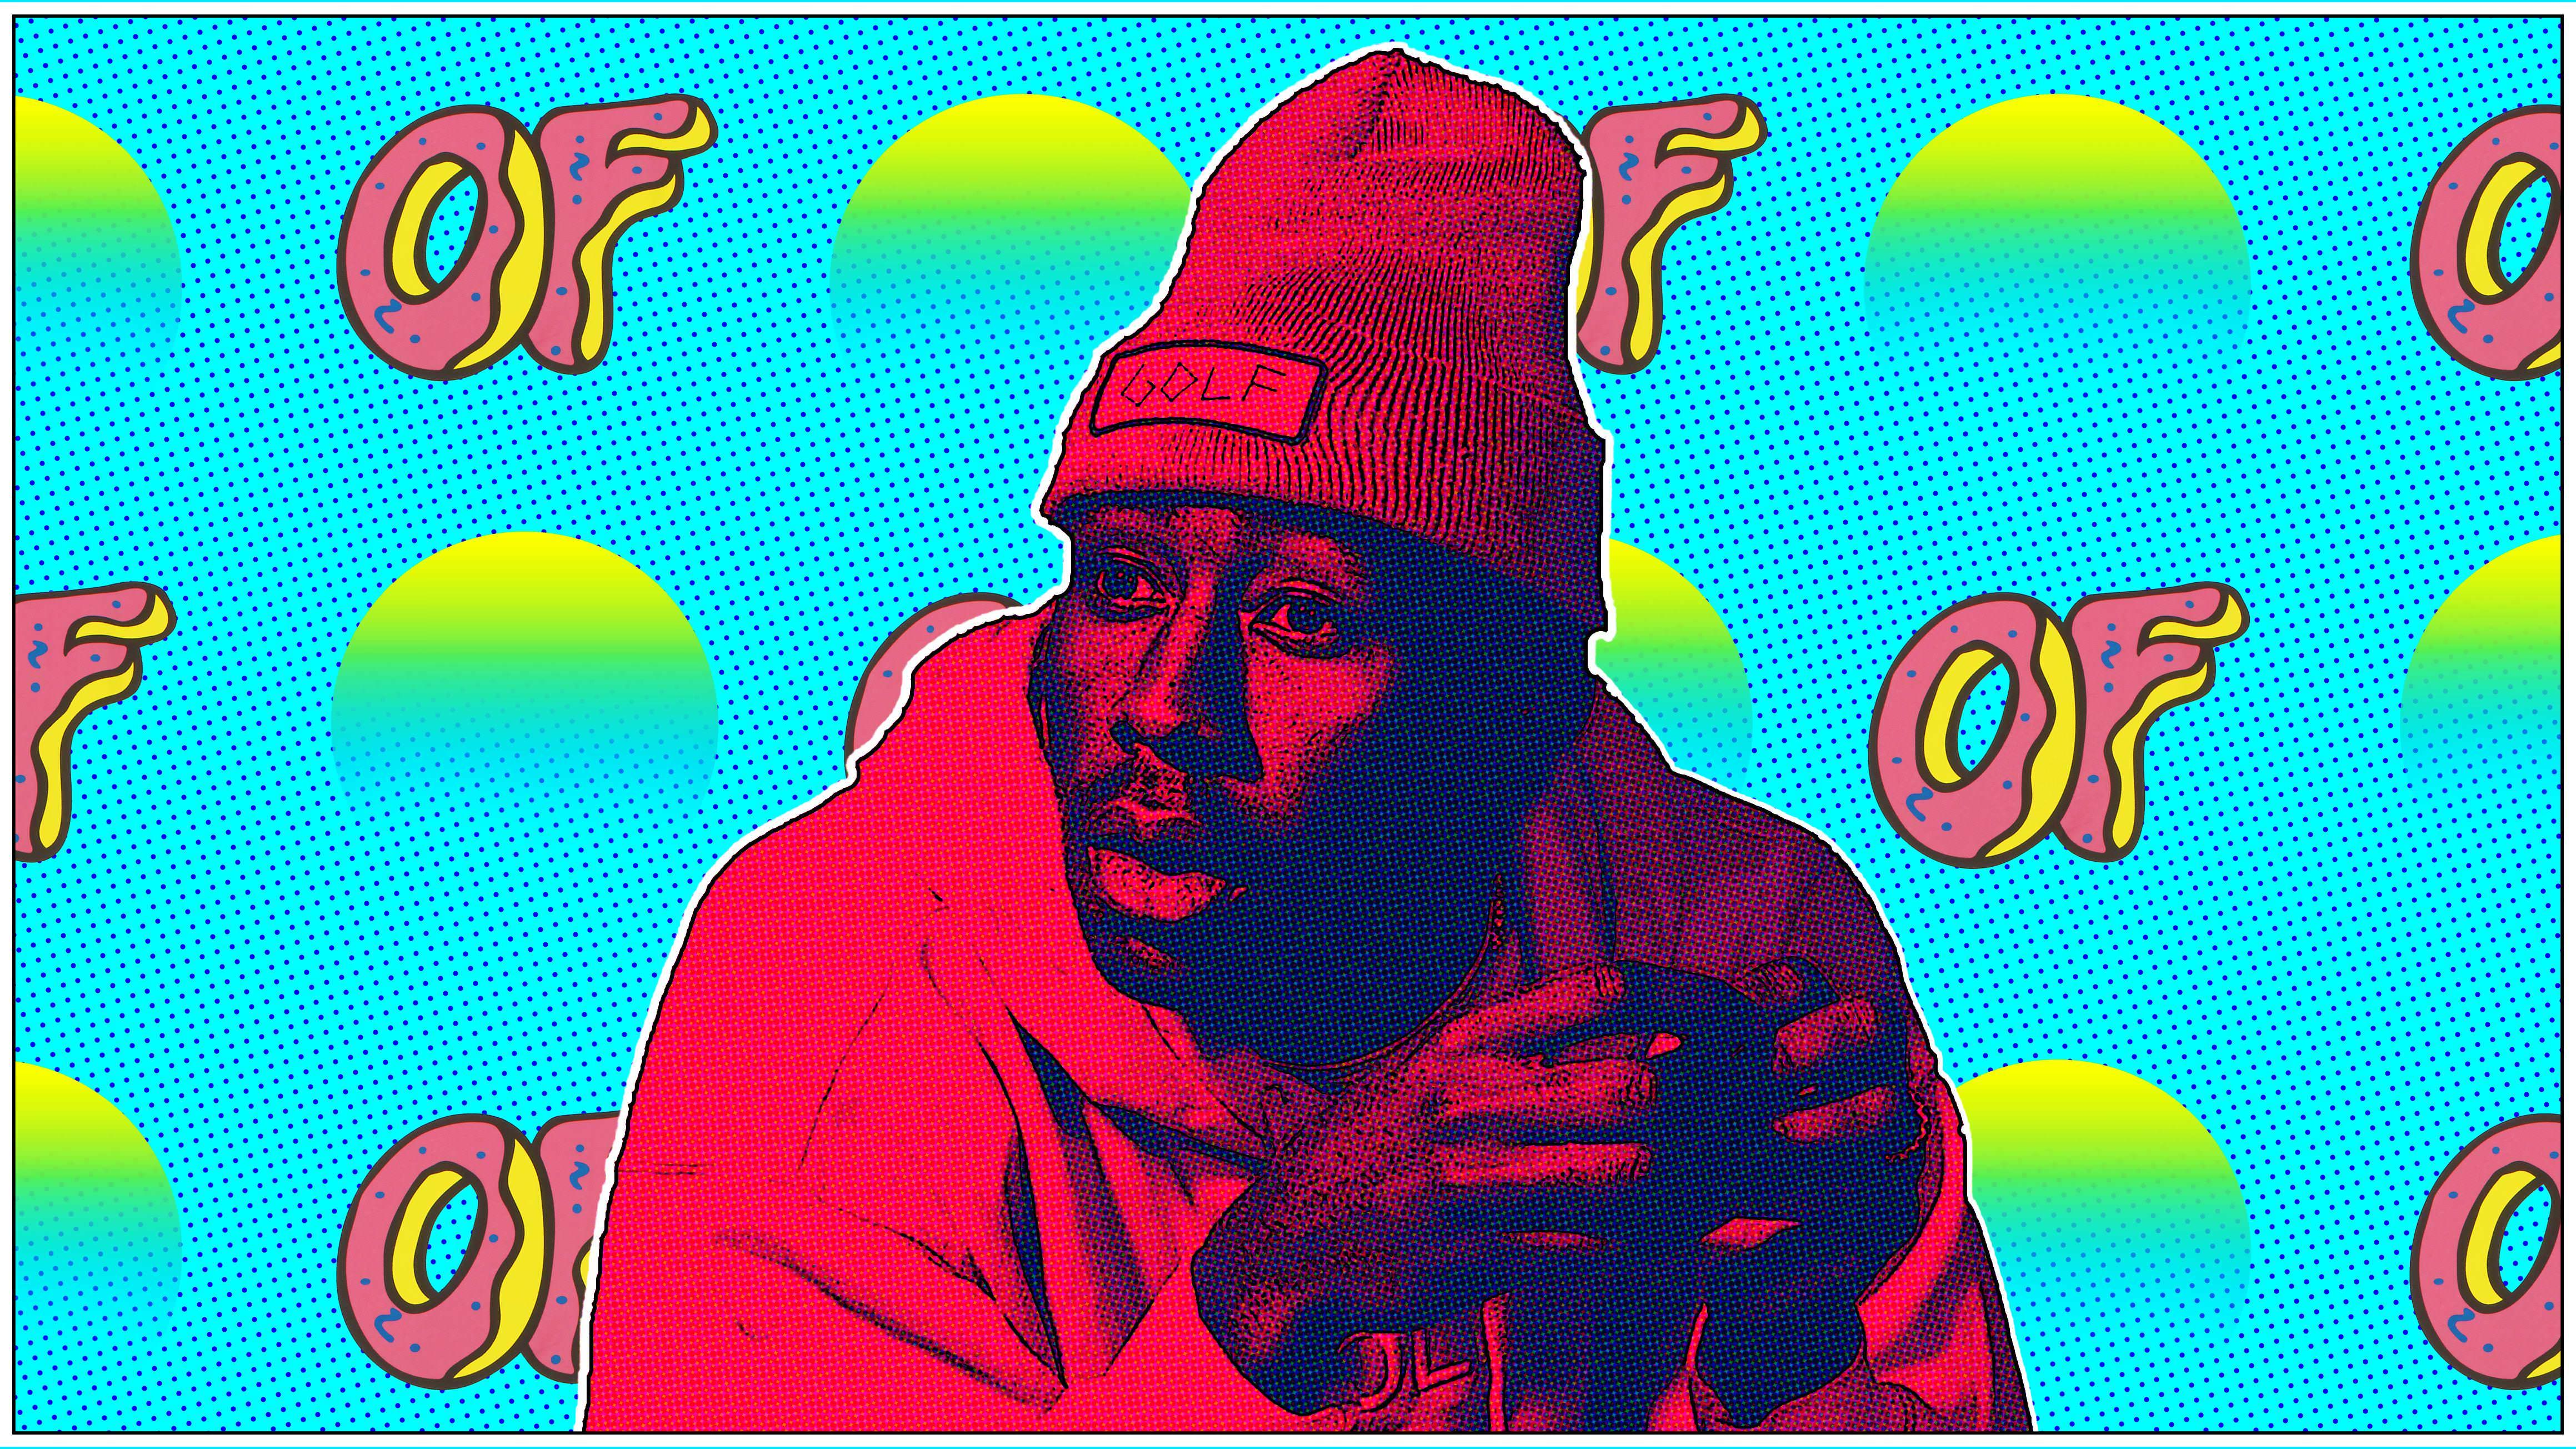 Tyler Rapper Wallpapers Top Free Tyler Rapper Backgrounds